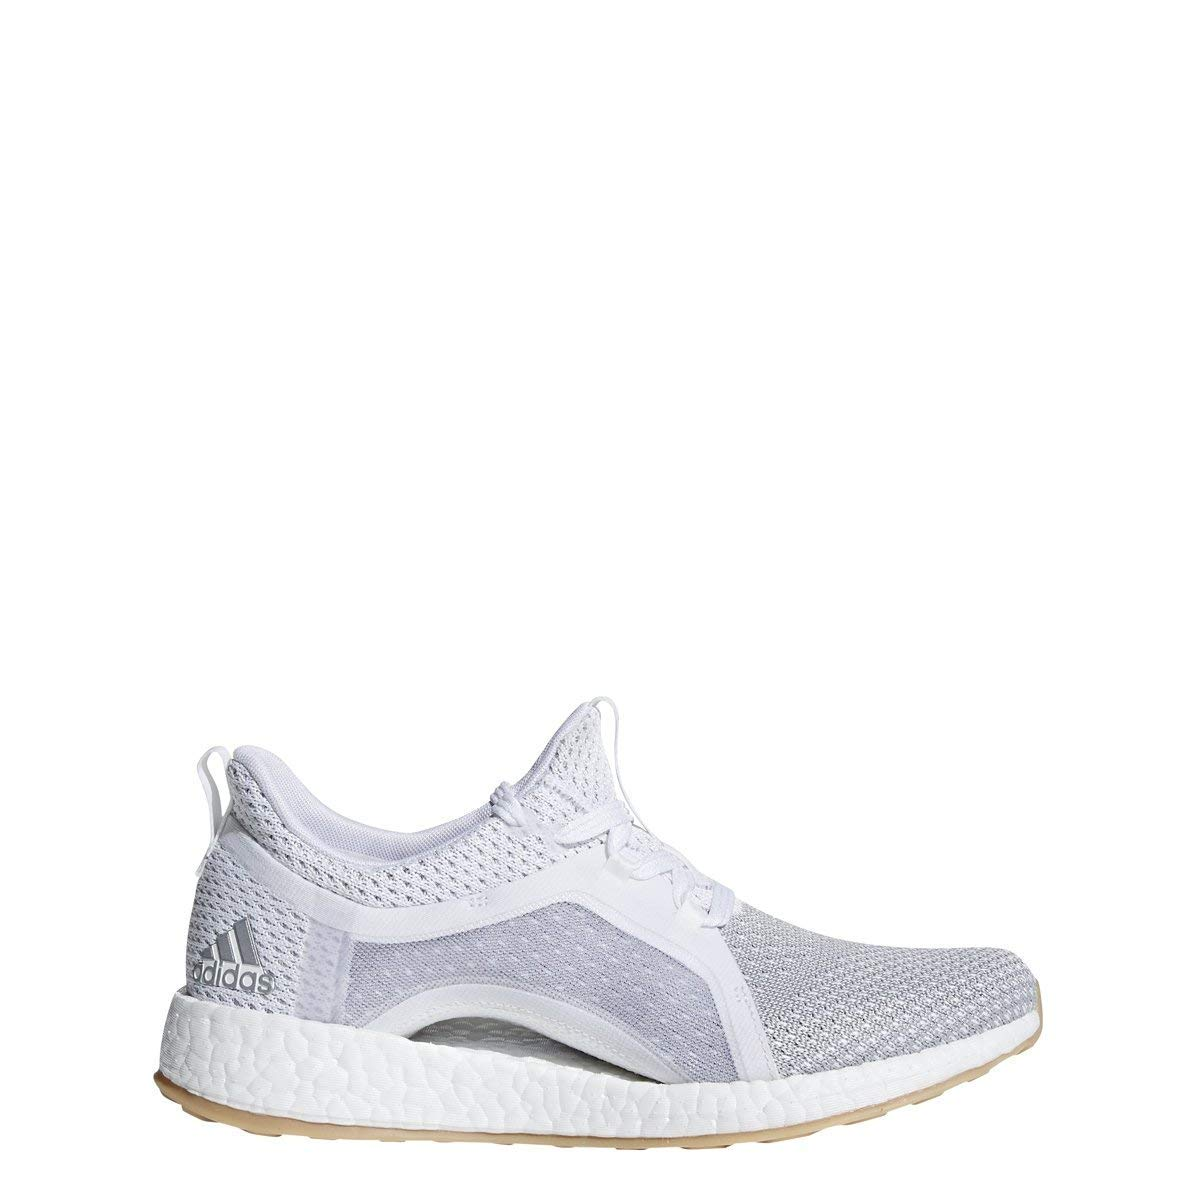 adidas Top Design & Good Price $114[Womens Running Energy